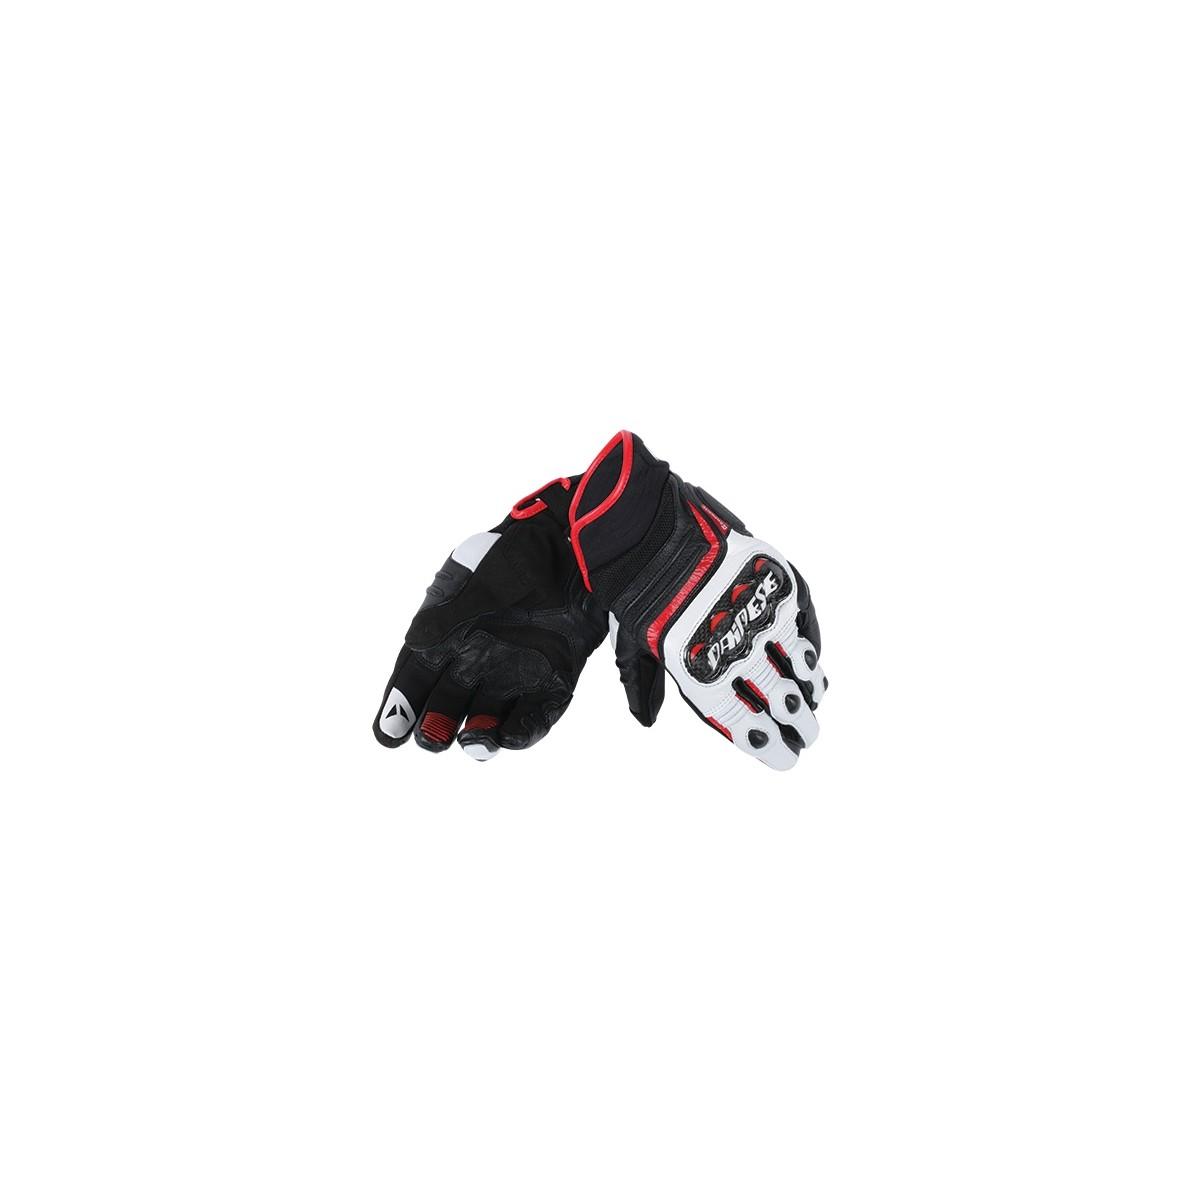 714d4166 Guantes Dainese Carbon D1 Short Lady negro/blanco/rojo, compra online